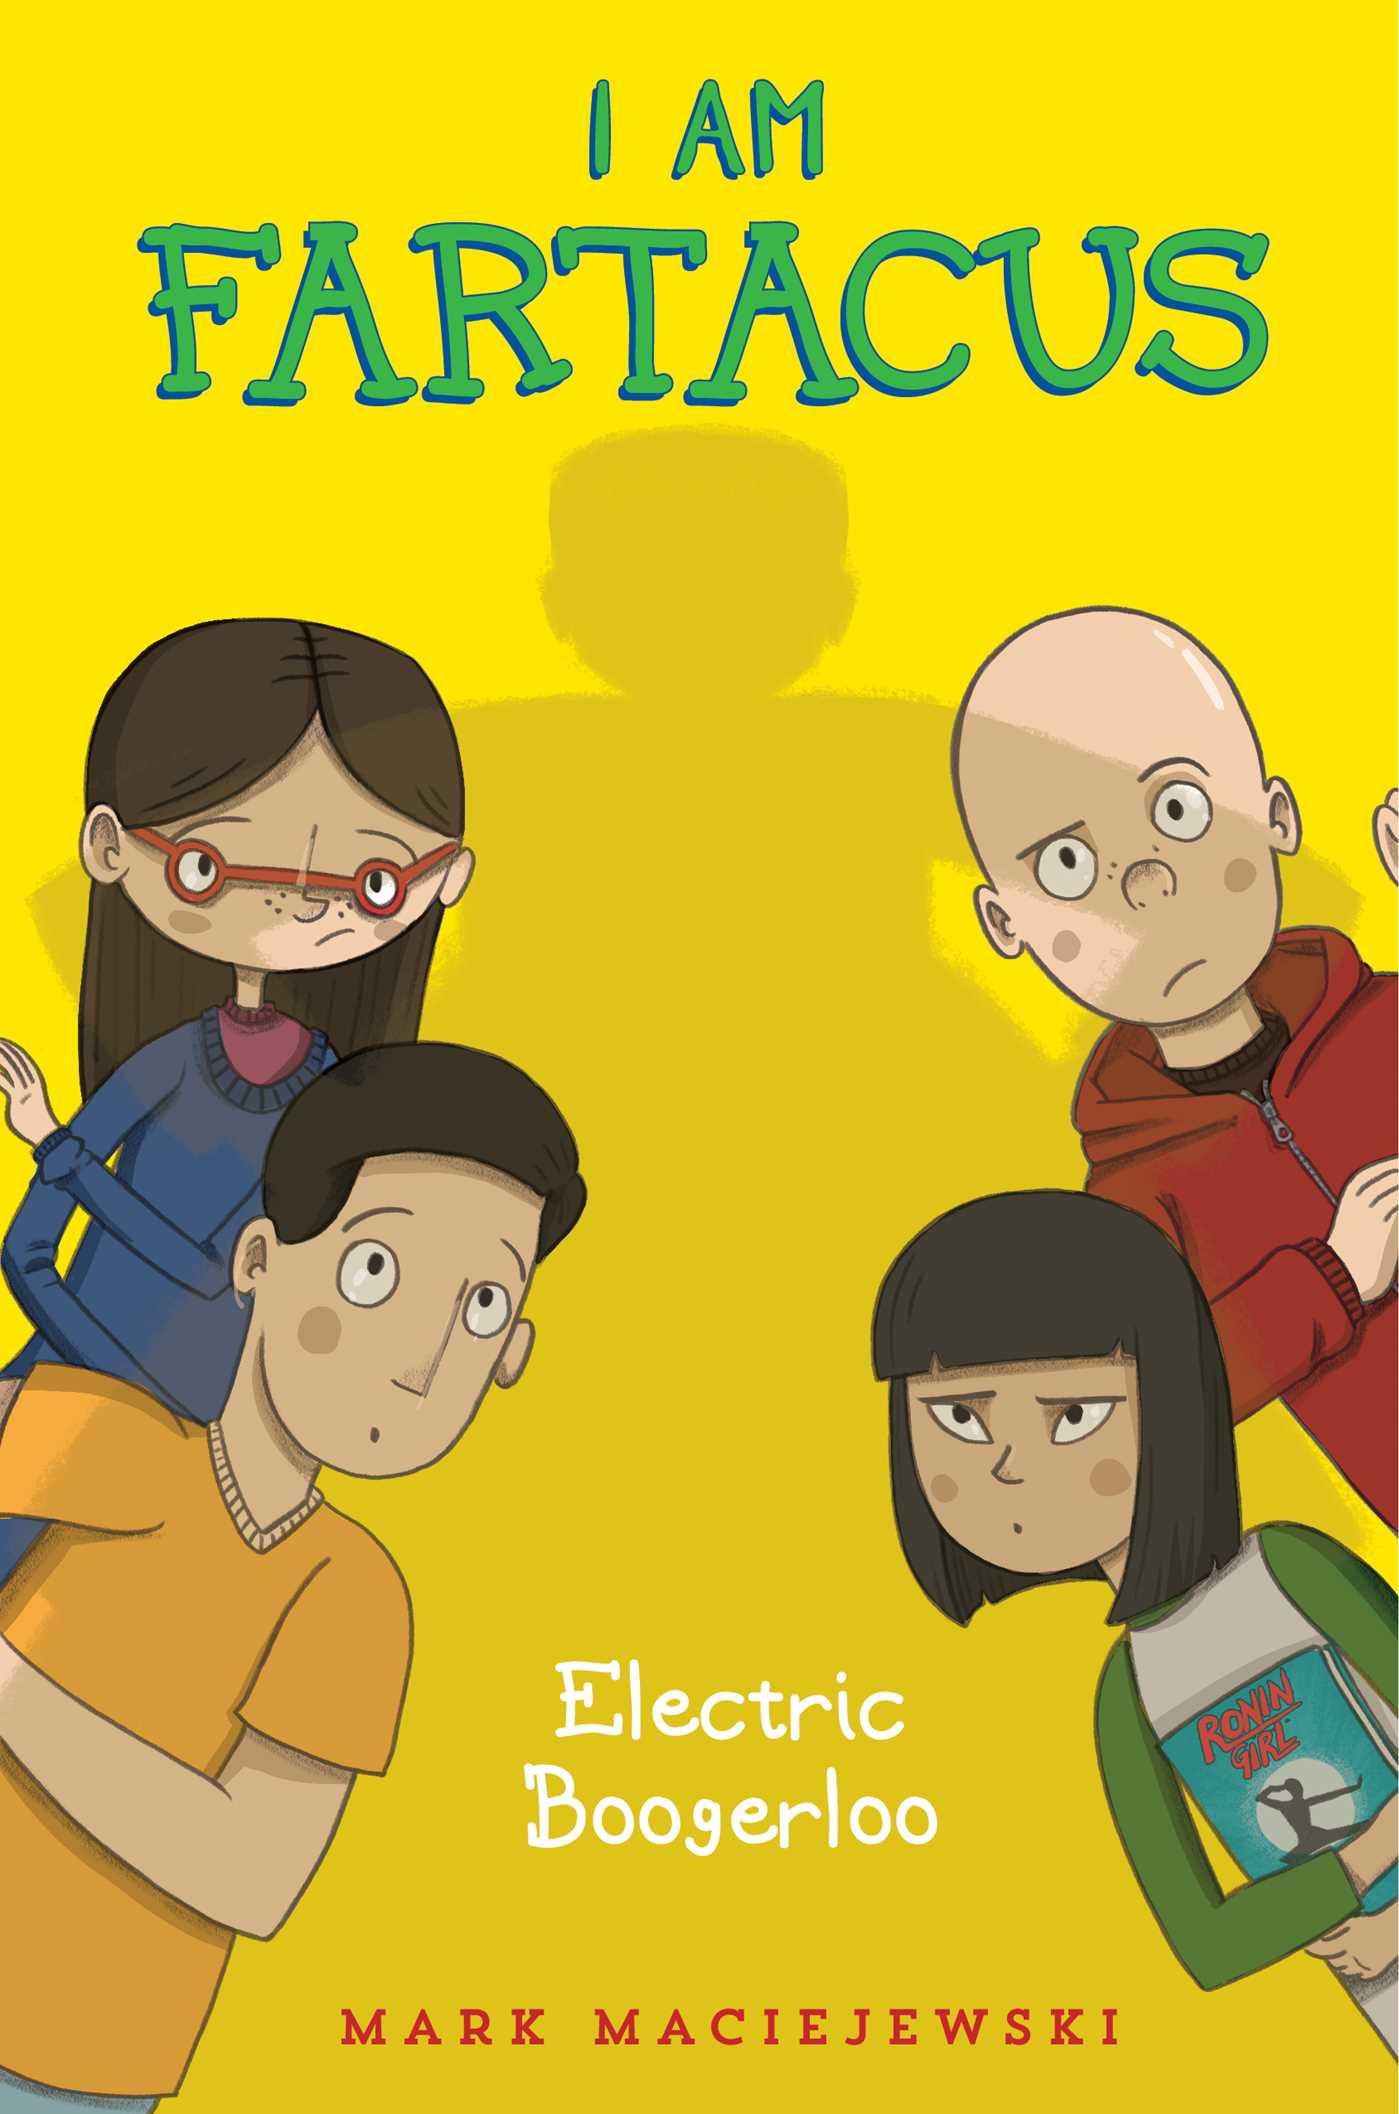 Electric boogerloo 9781481464239 hr